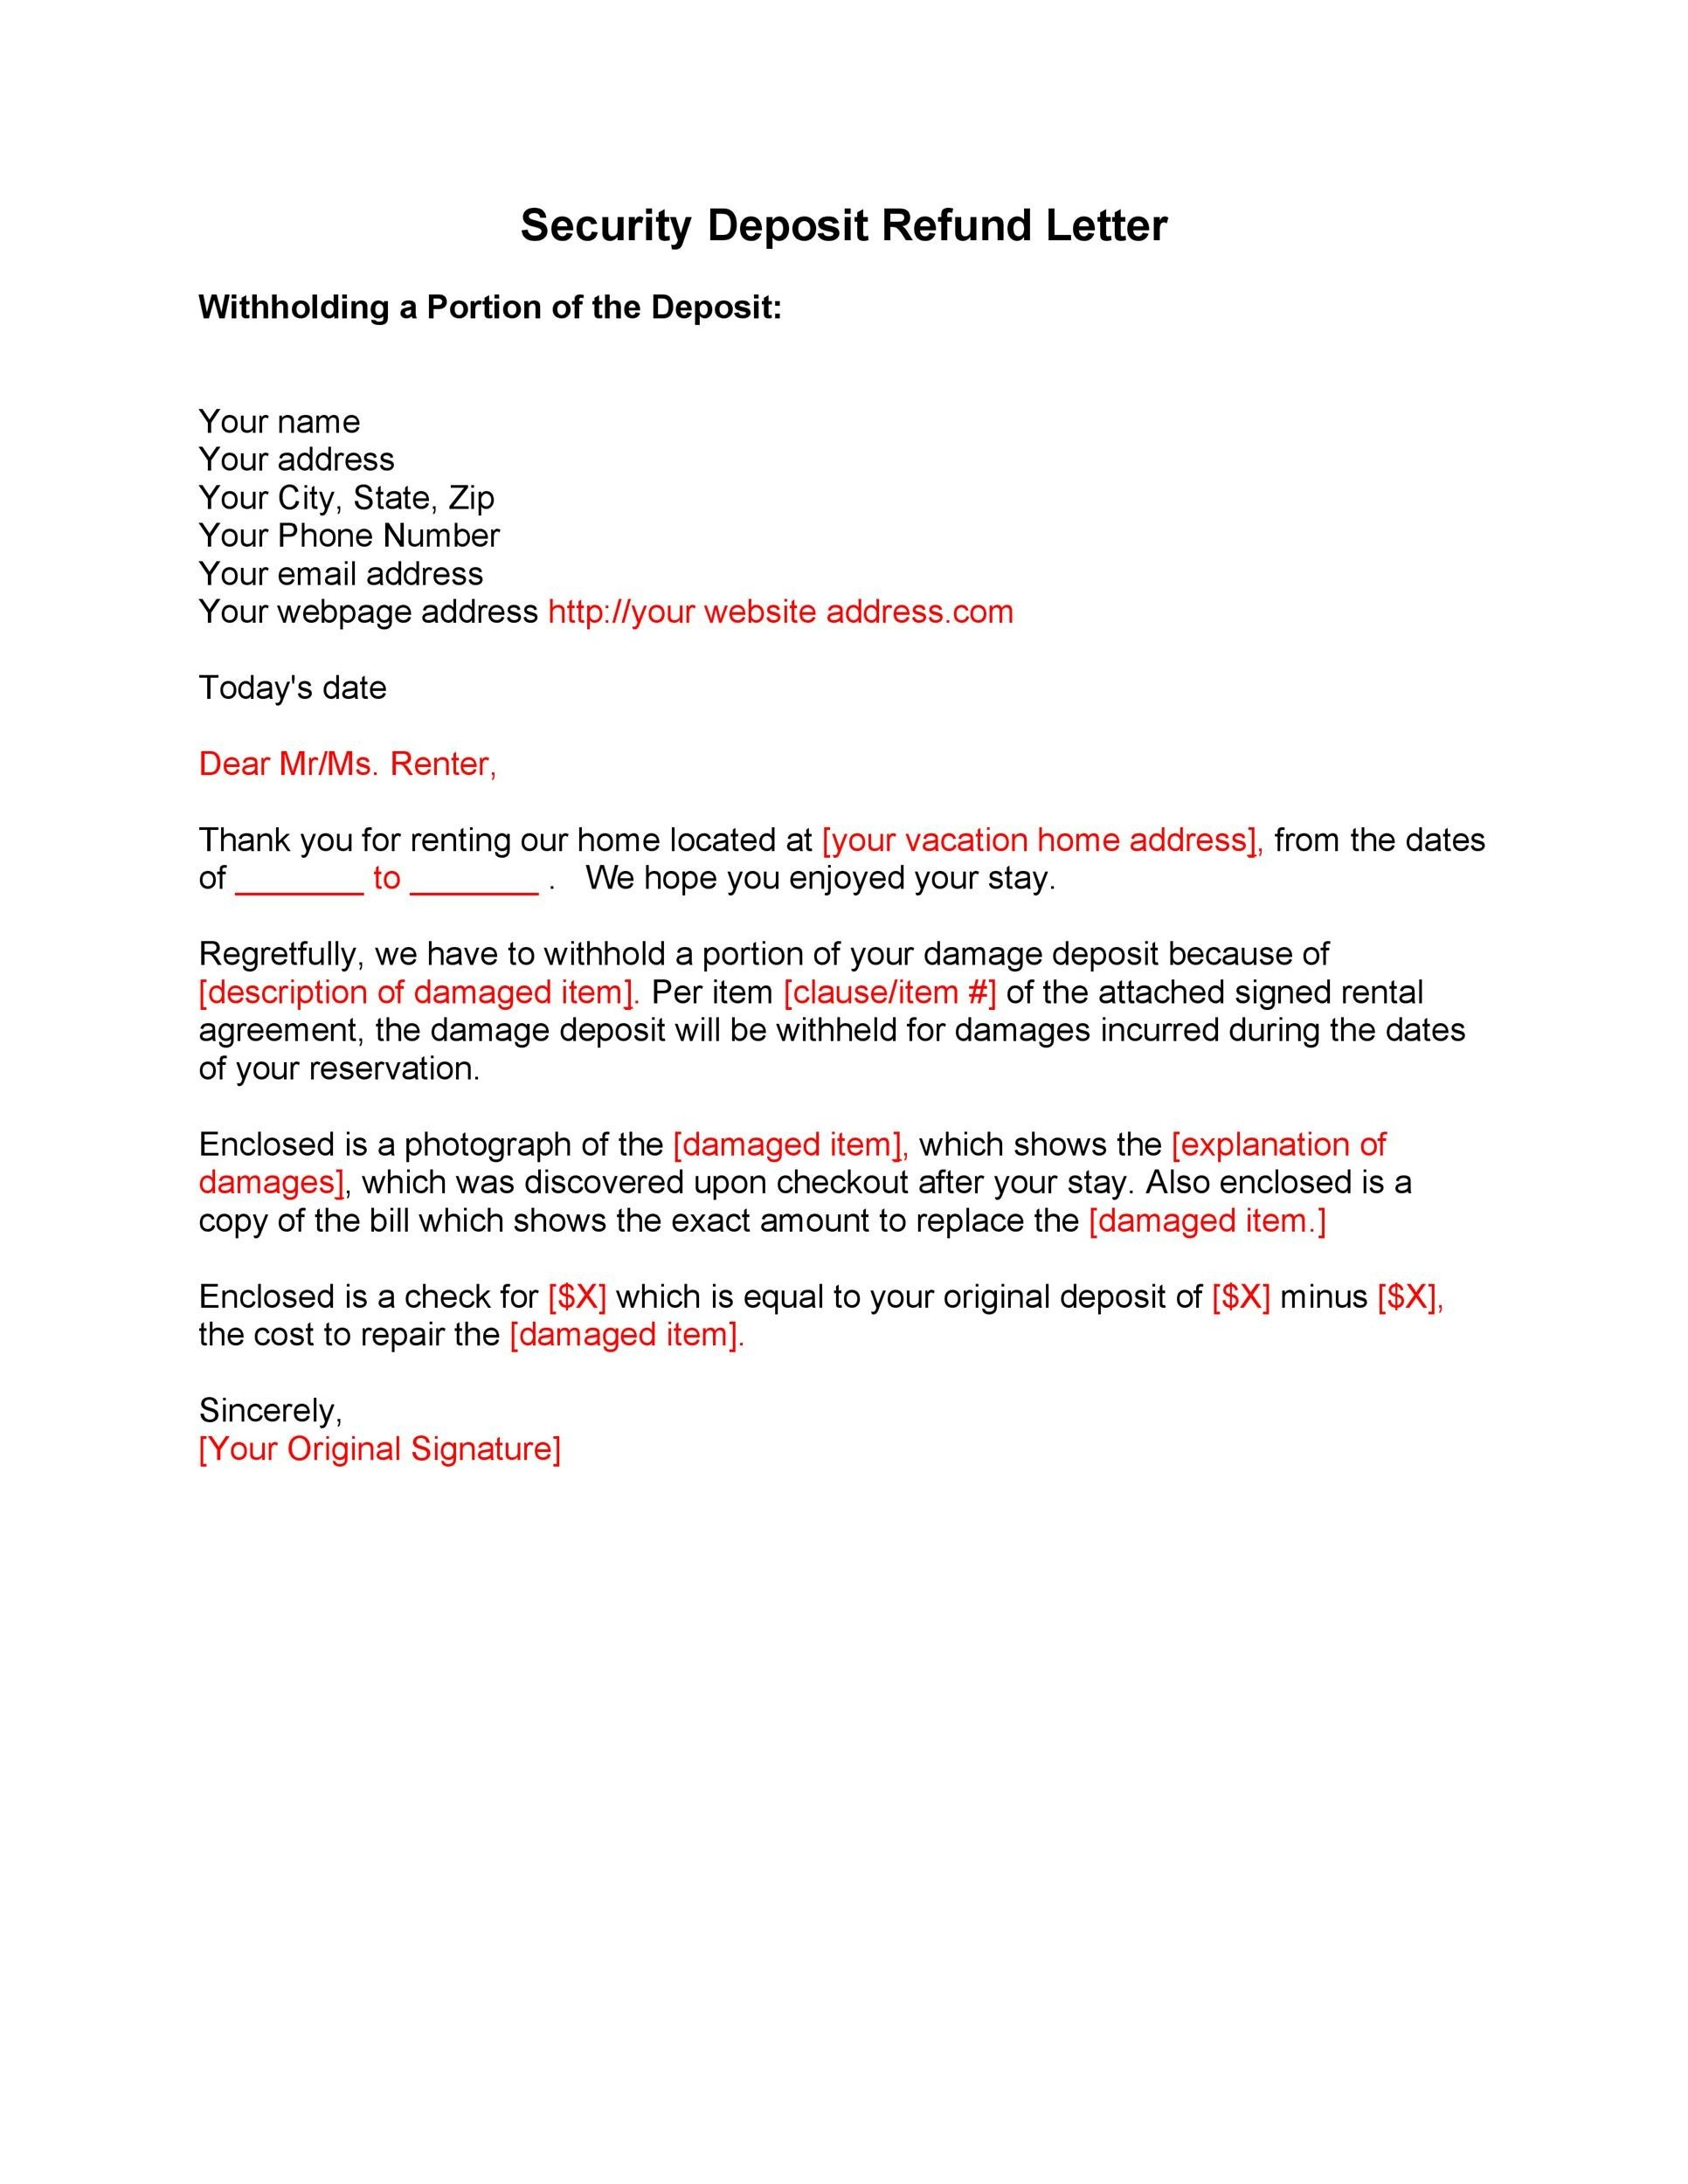 50 Effective Security Deposit Return Letters [MS Word] ᐅ